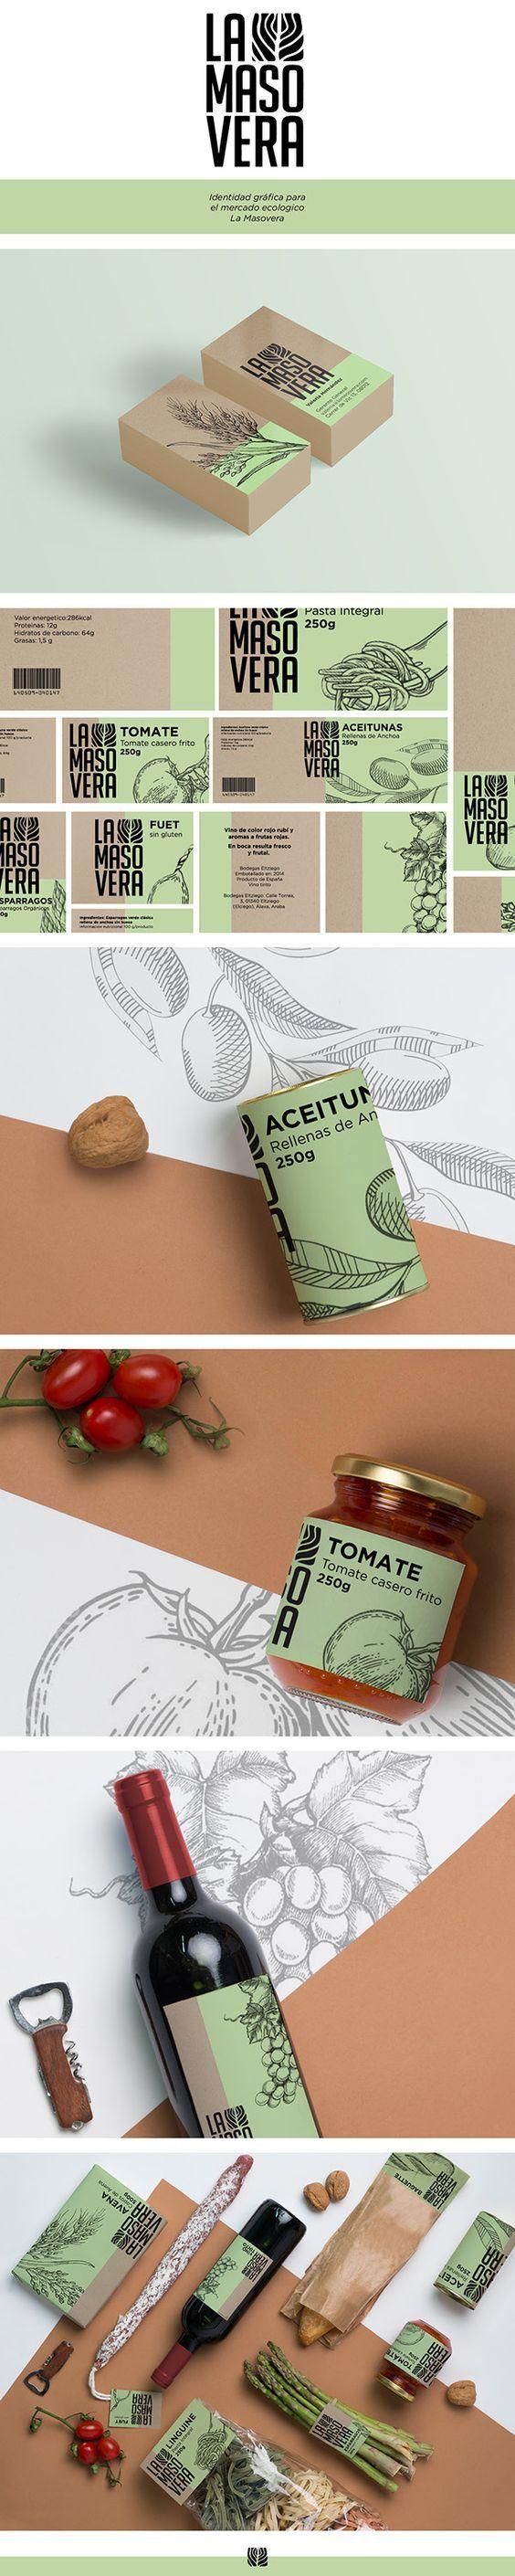 (54) Identidad gráfica para un supermercado ecológico ficticio. | graphic design | Pinterest / Branding / Ideas / Inspiration / Packaging / Design / Organic / Ecologic / Supermarket / Carton / Pale Green / Brand / Botanical / Nature